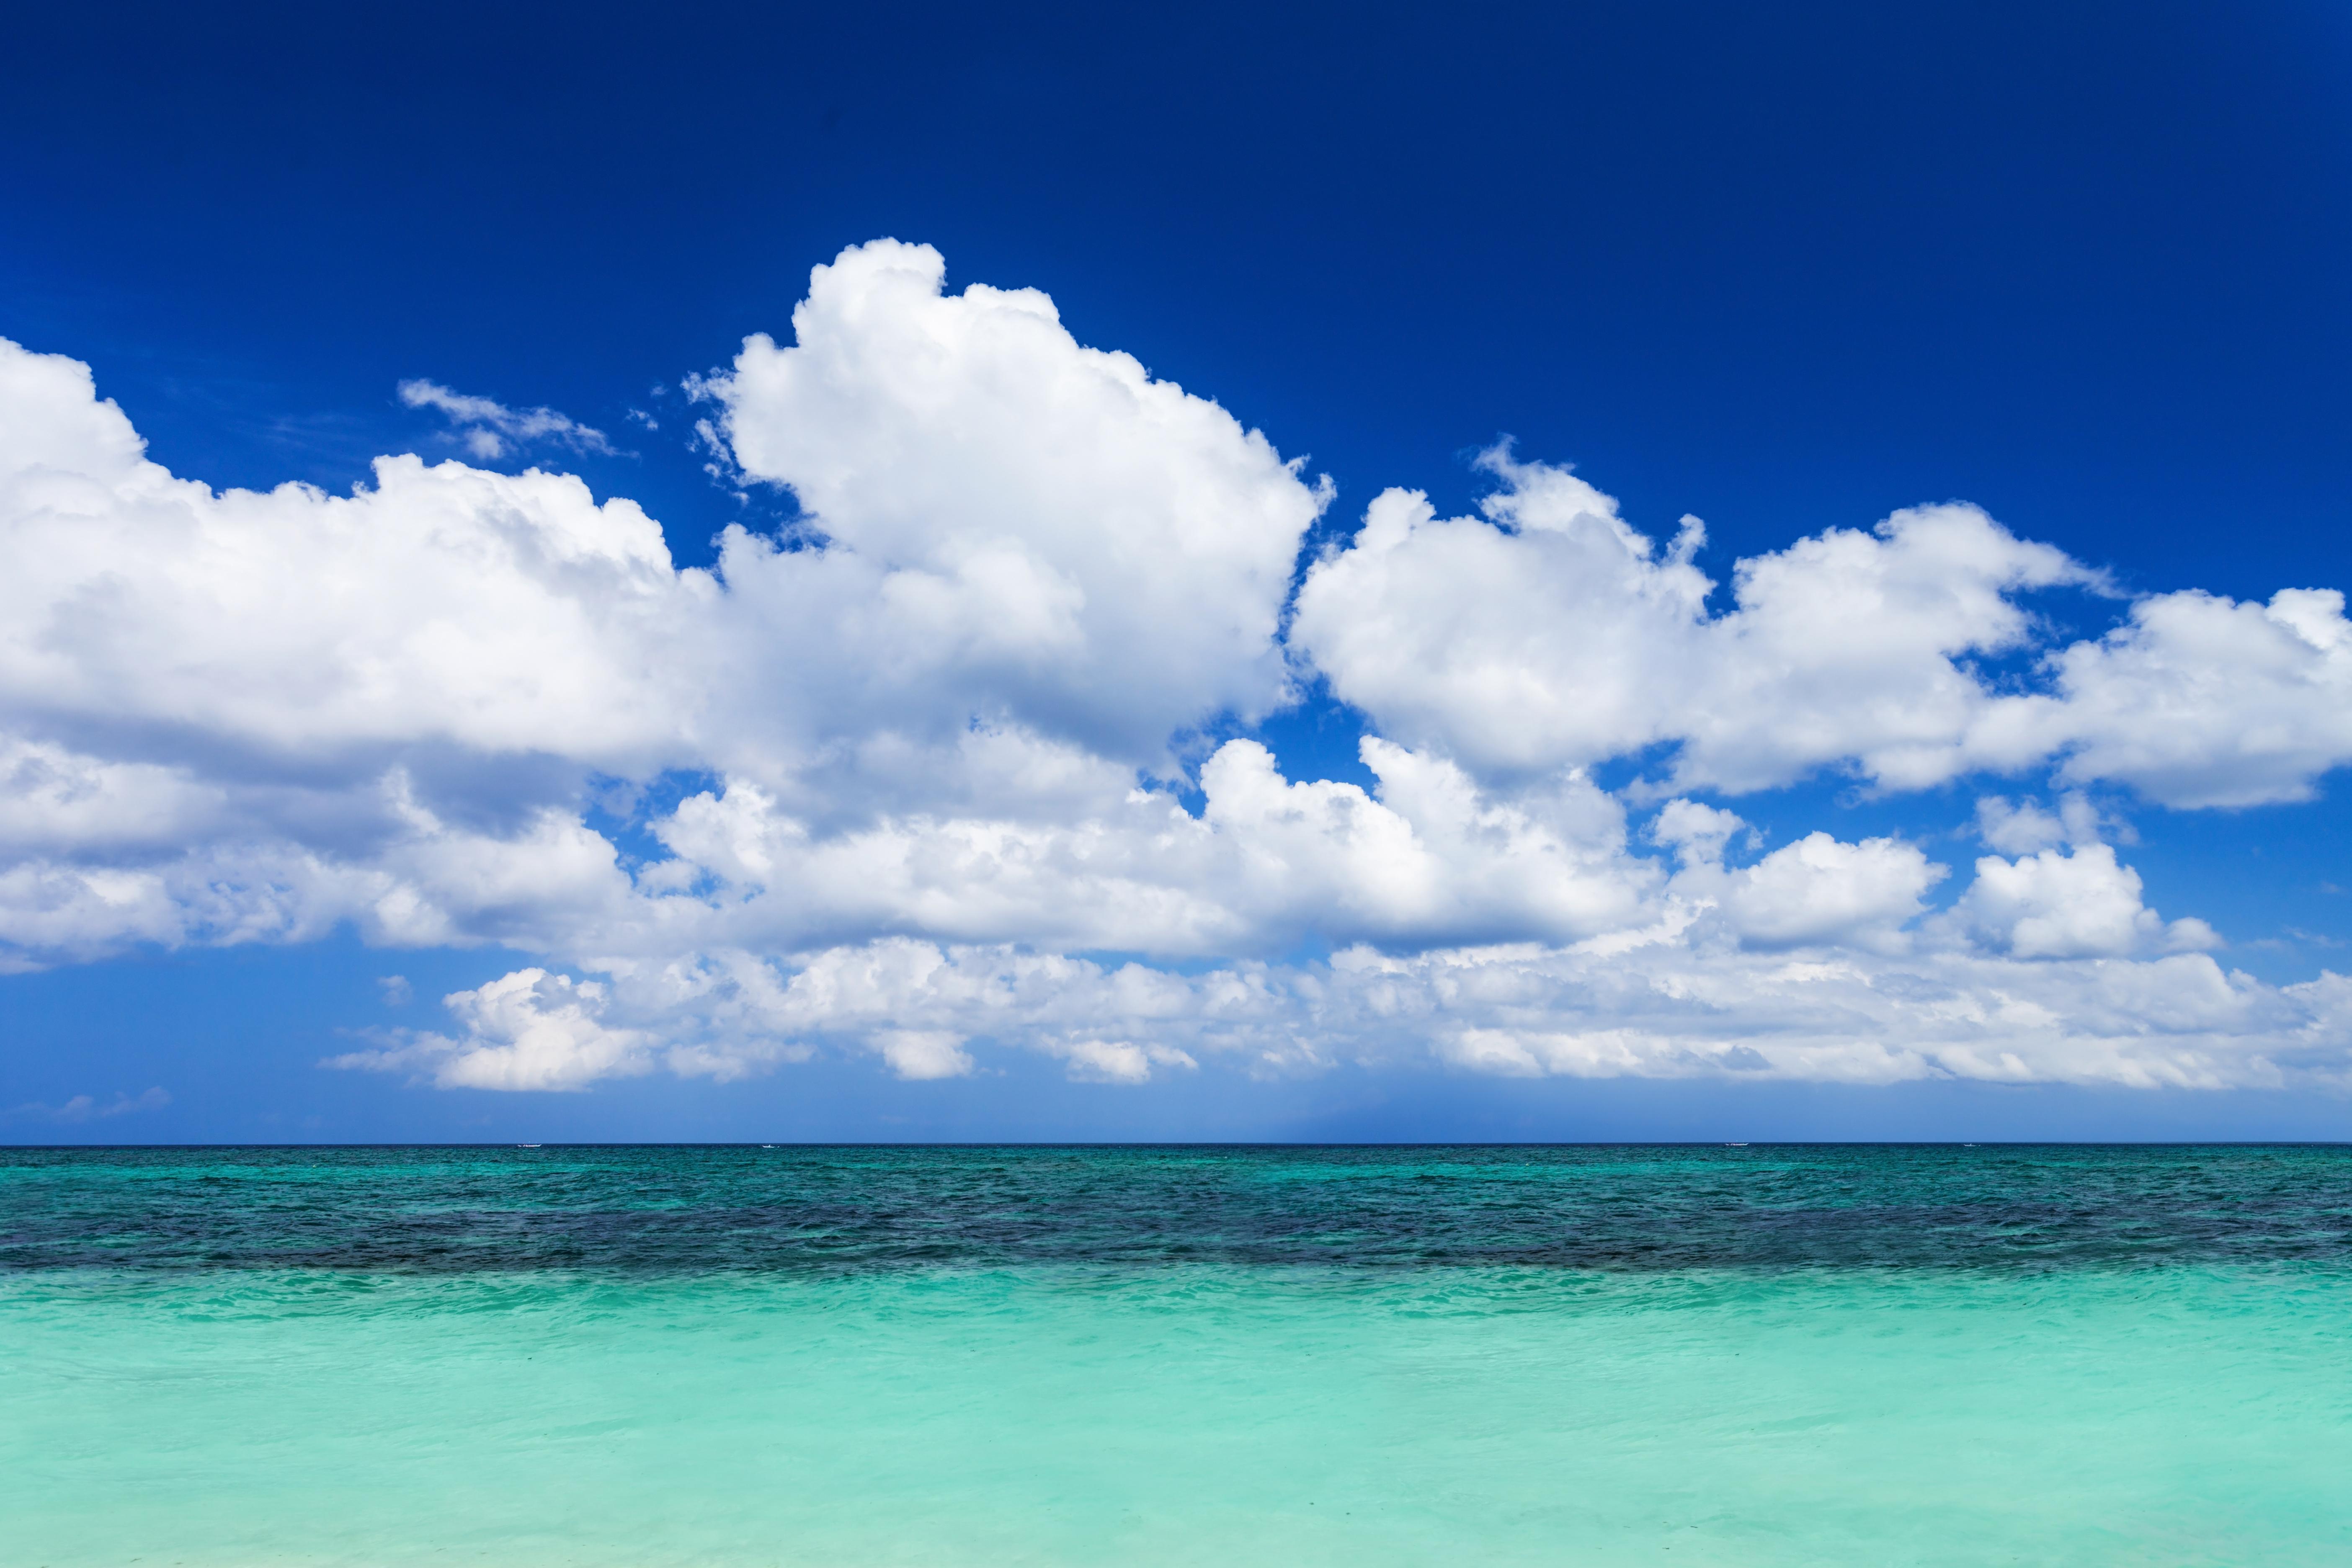 beach scene in the florida keys